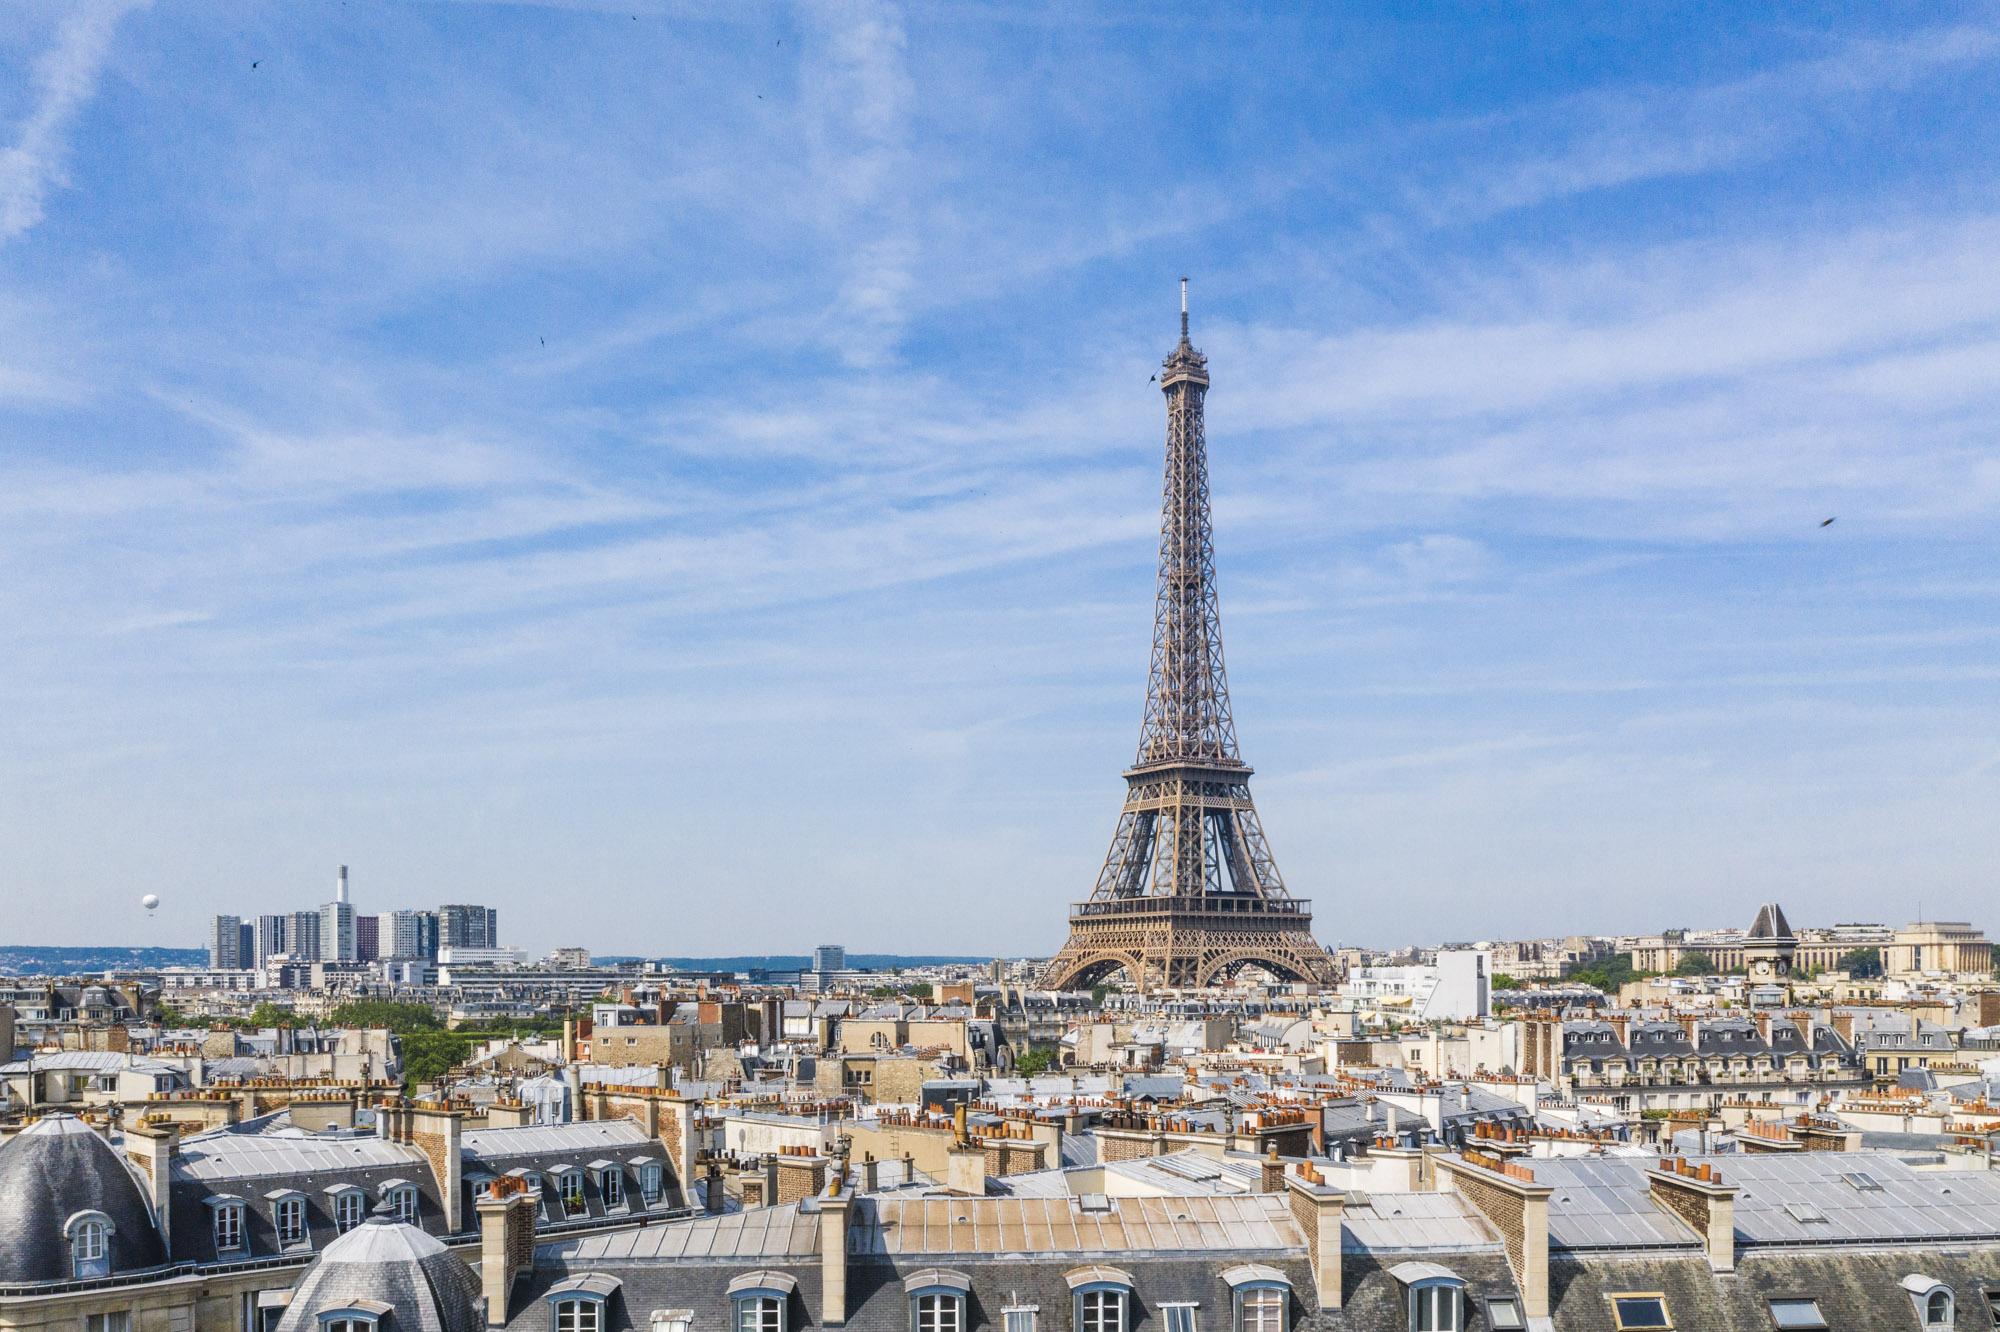 agence audiovisuelle Paris